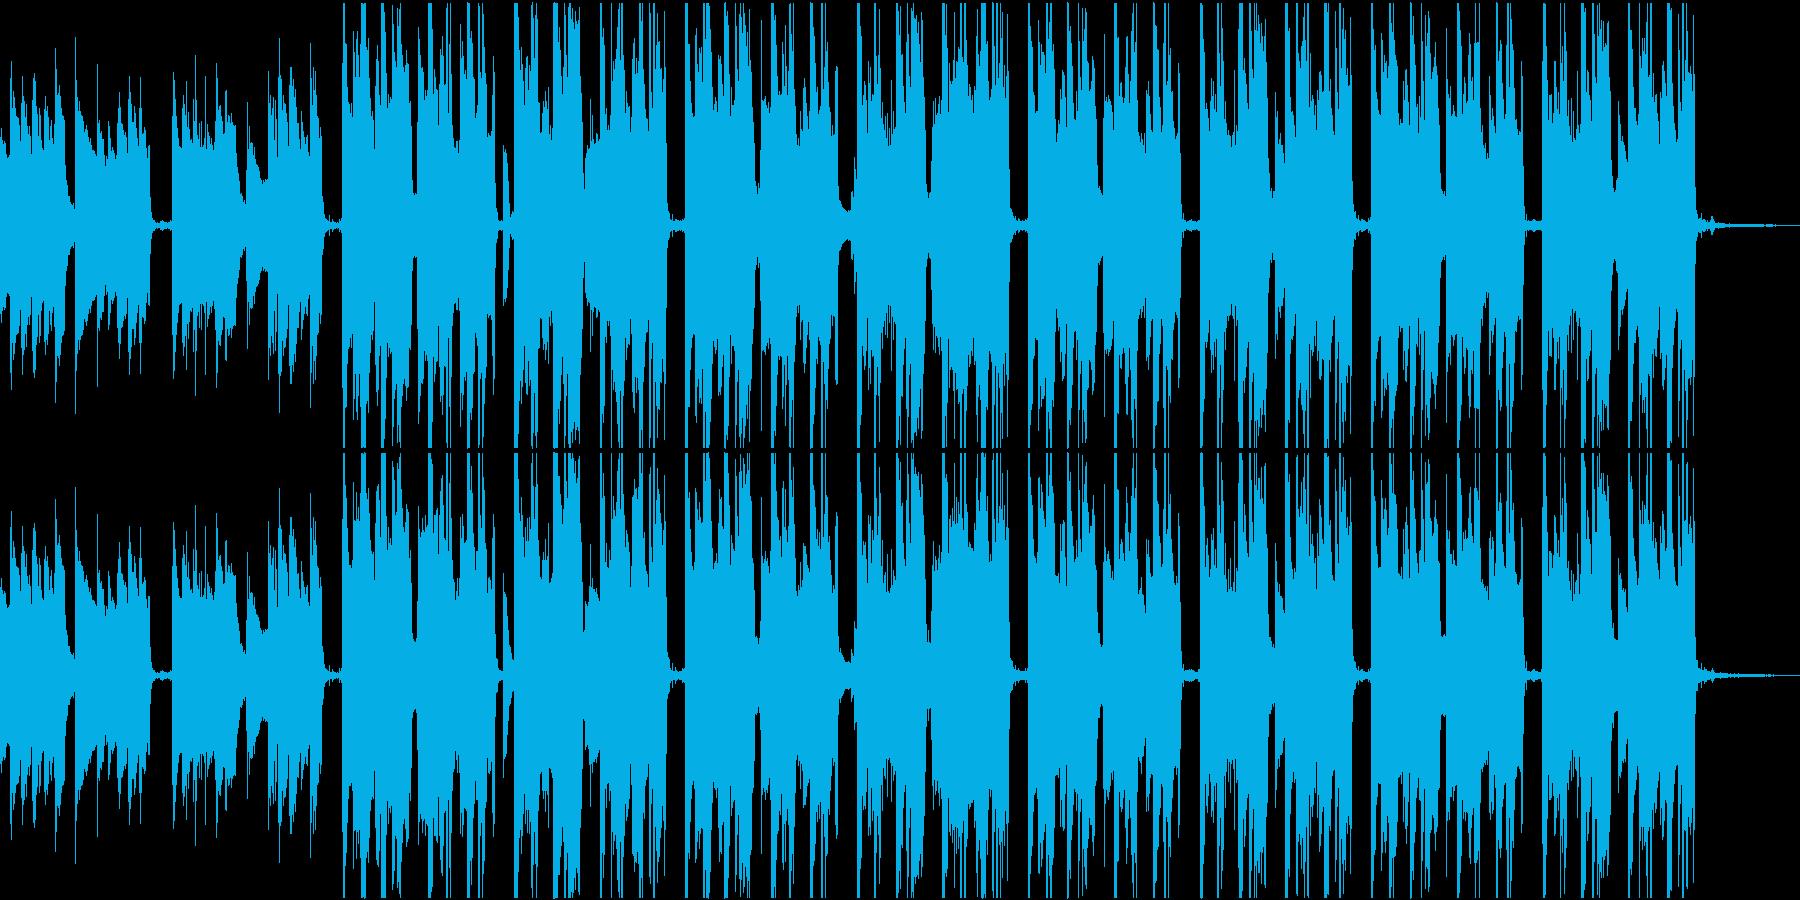 Lo-FiでおしゃれなゆったりしたBGMの再生済みの波形